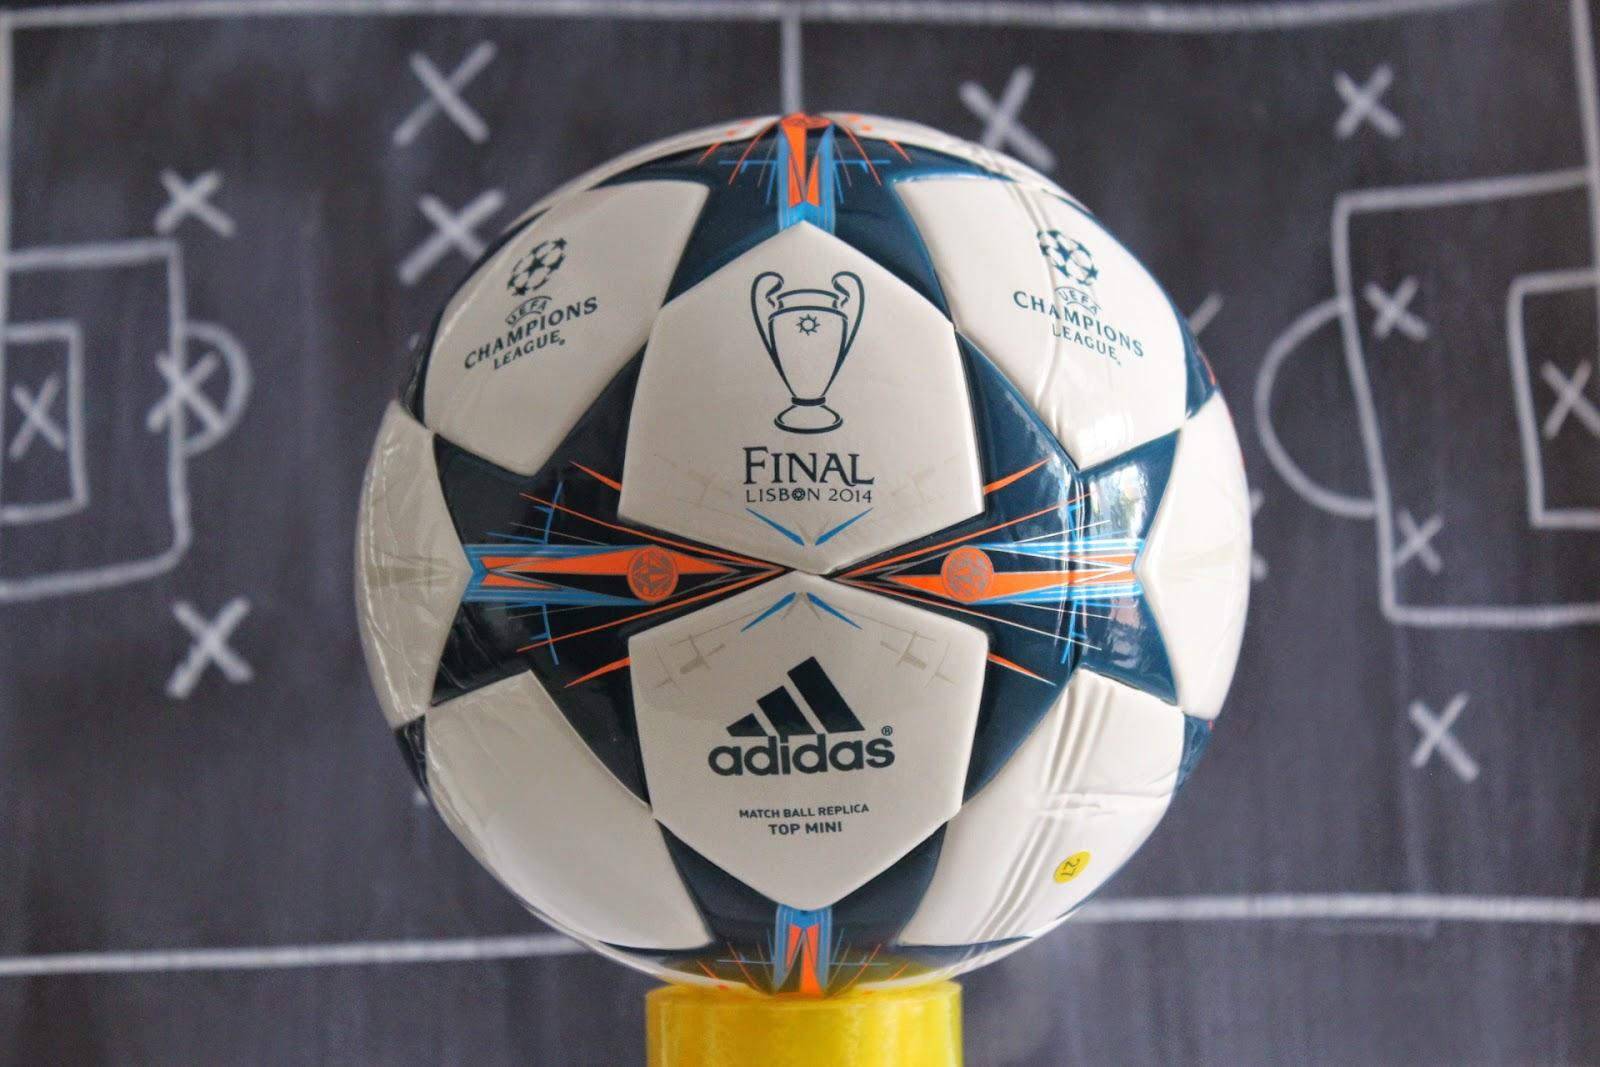 Final Champions 2014 Lisboa Adidas mini balón soccer ball - talla 1  25€  8a8430b3d3340